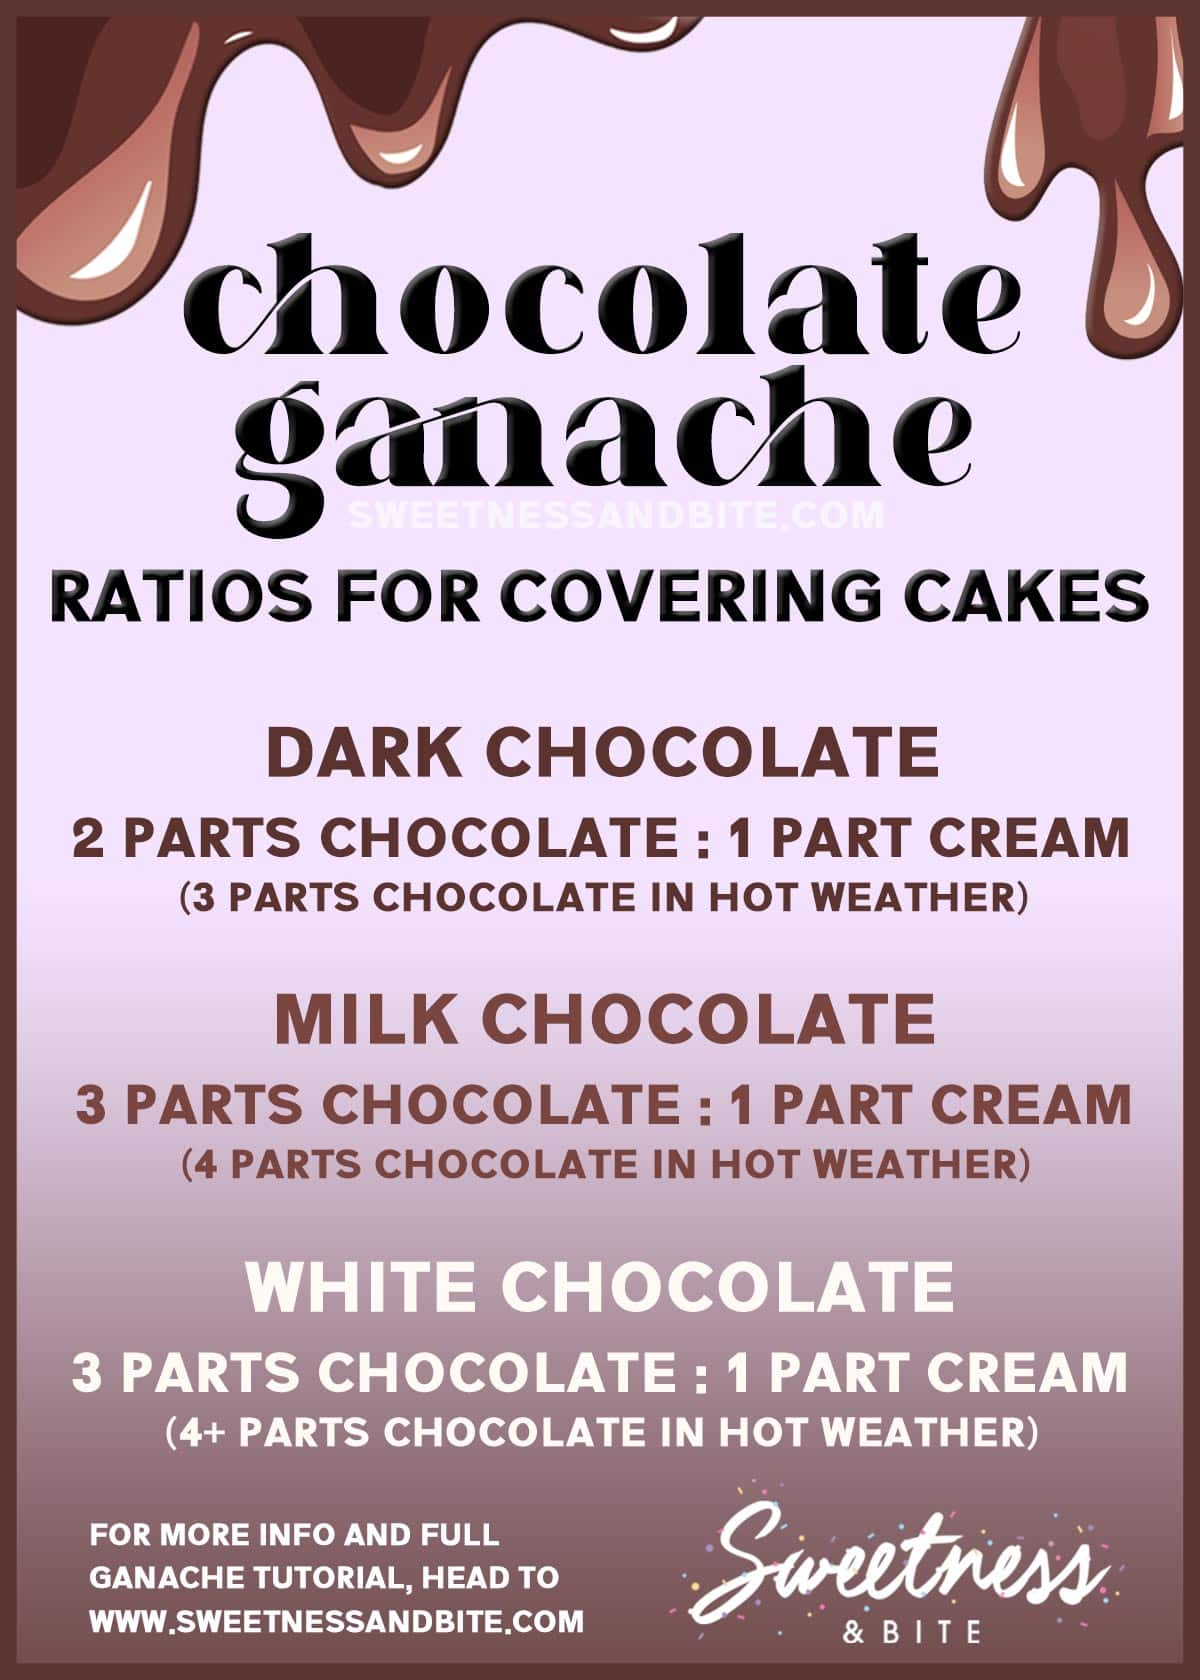 Infographic showing the chocolate ganache ratios for dark, milk and white chocolate ganache.